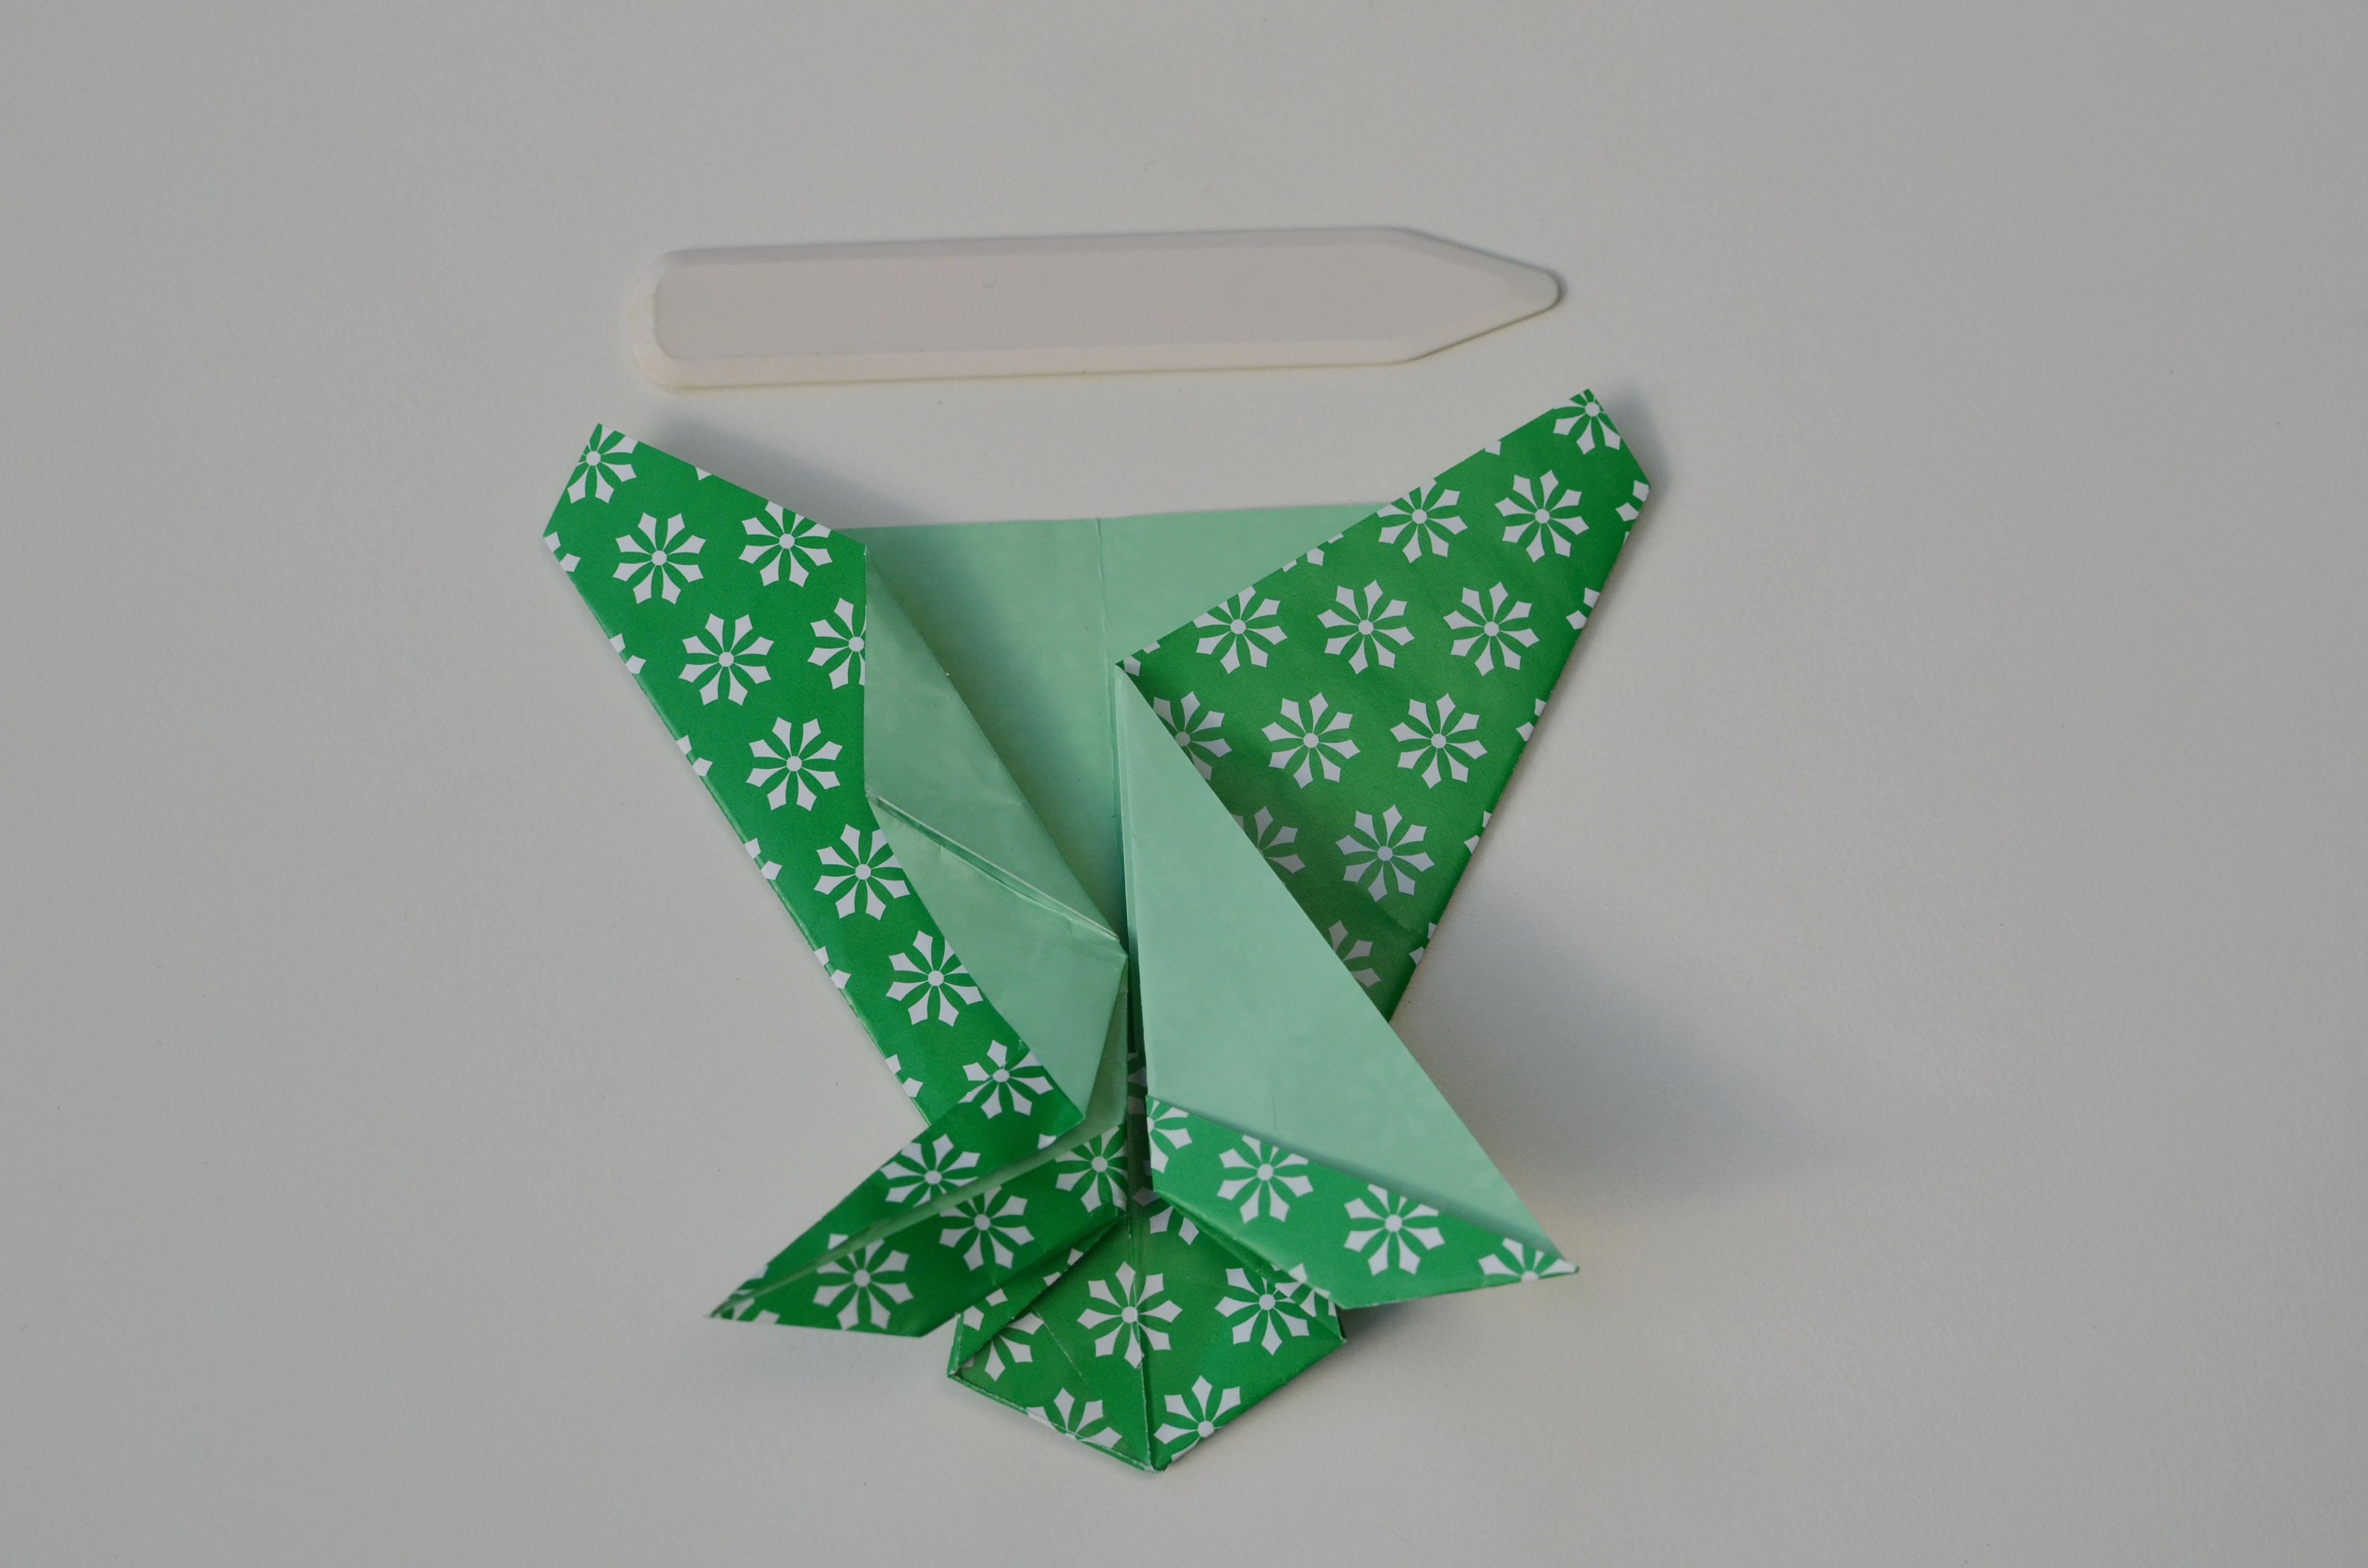 braincrafts_frog_origami_pt36.jpg